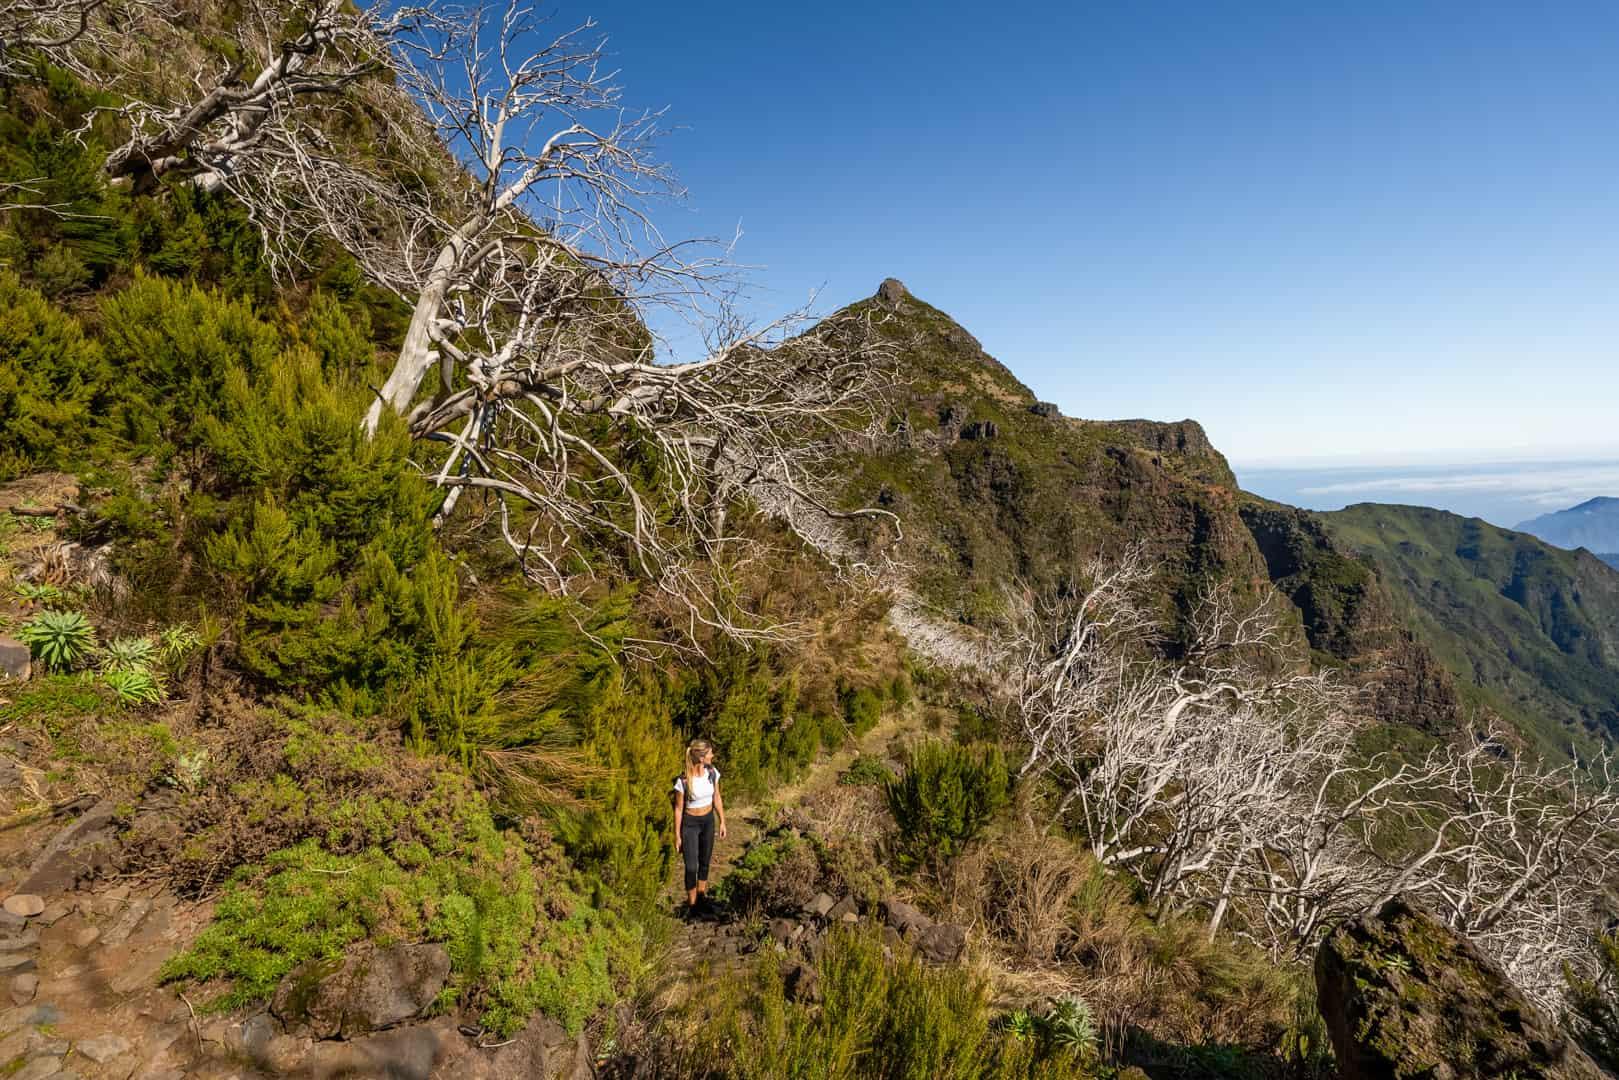 dead-tree-forest-pico-do-arieiro-path